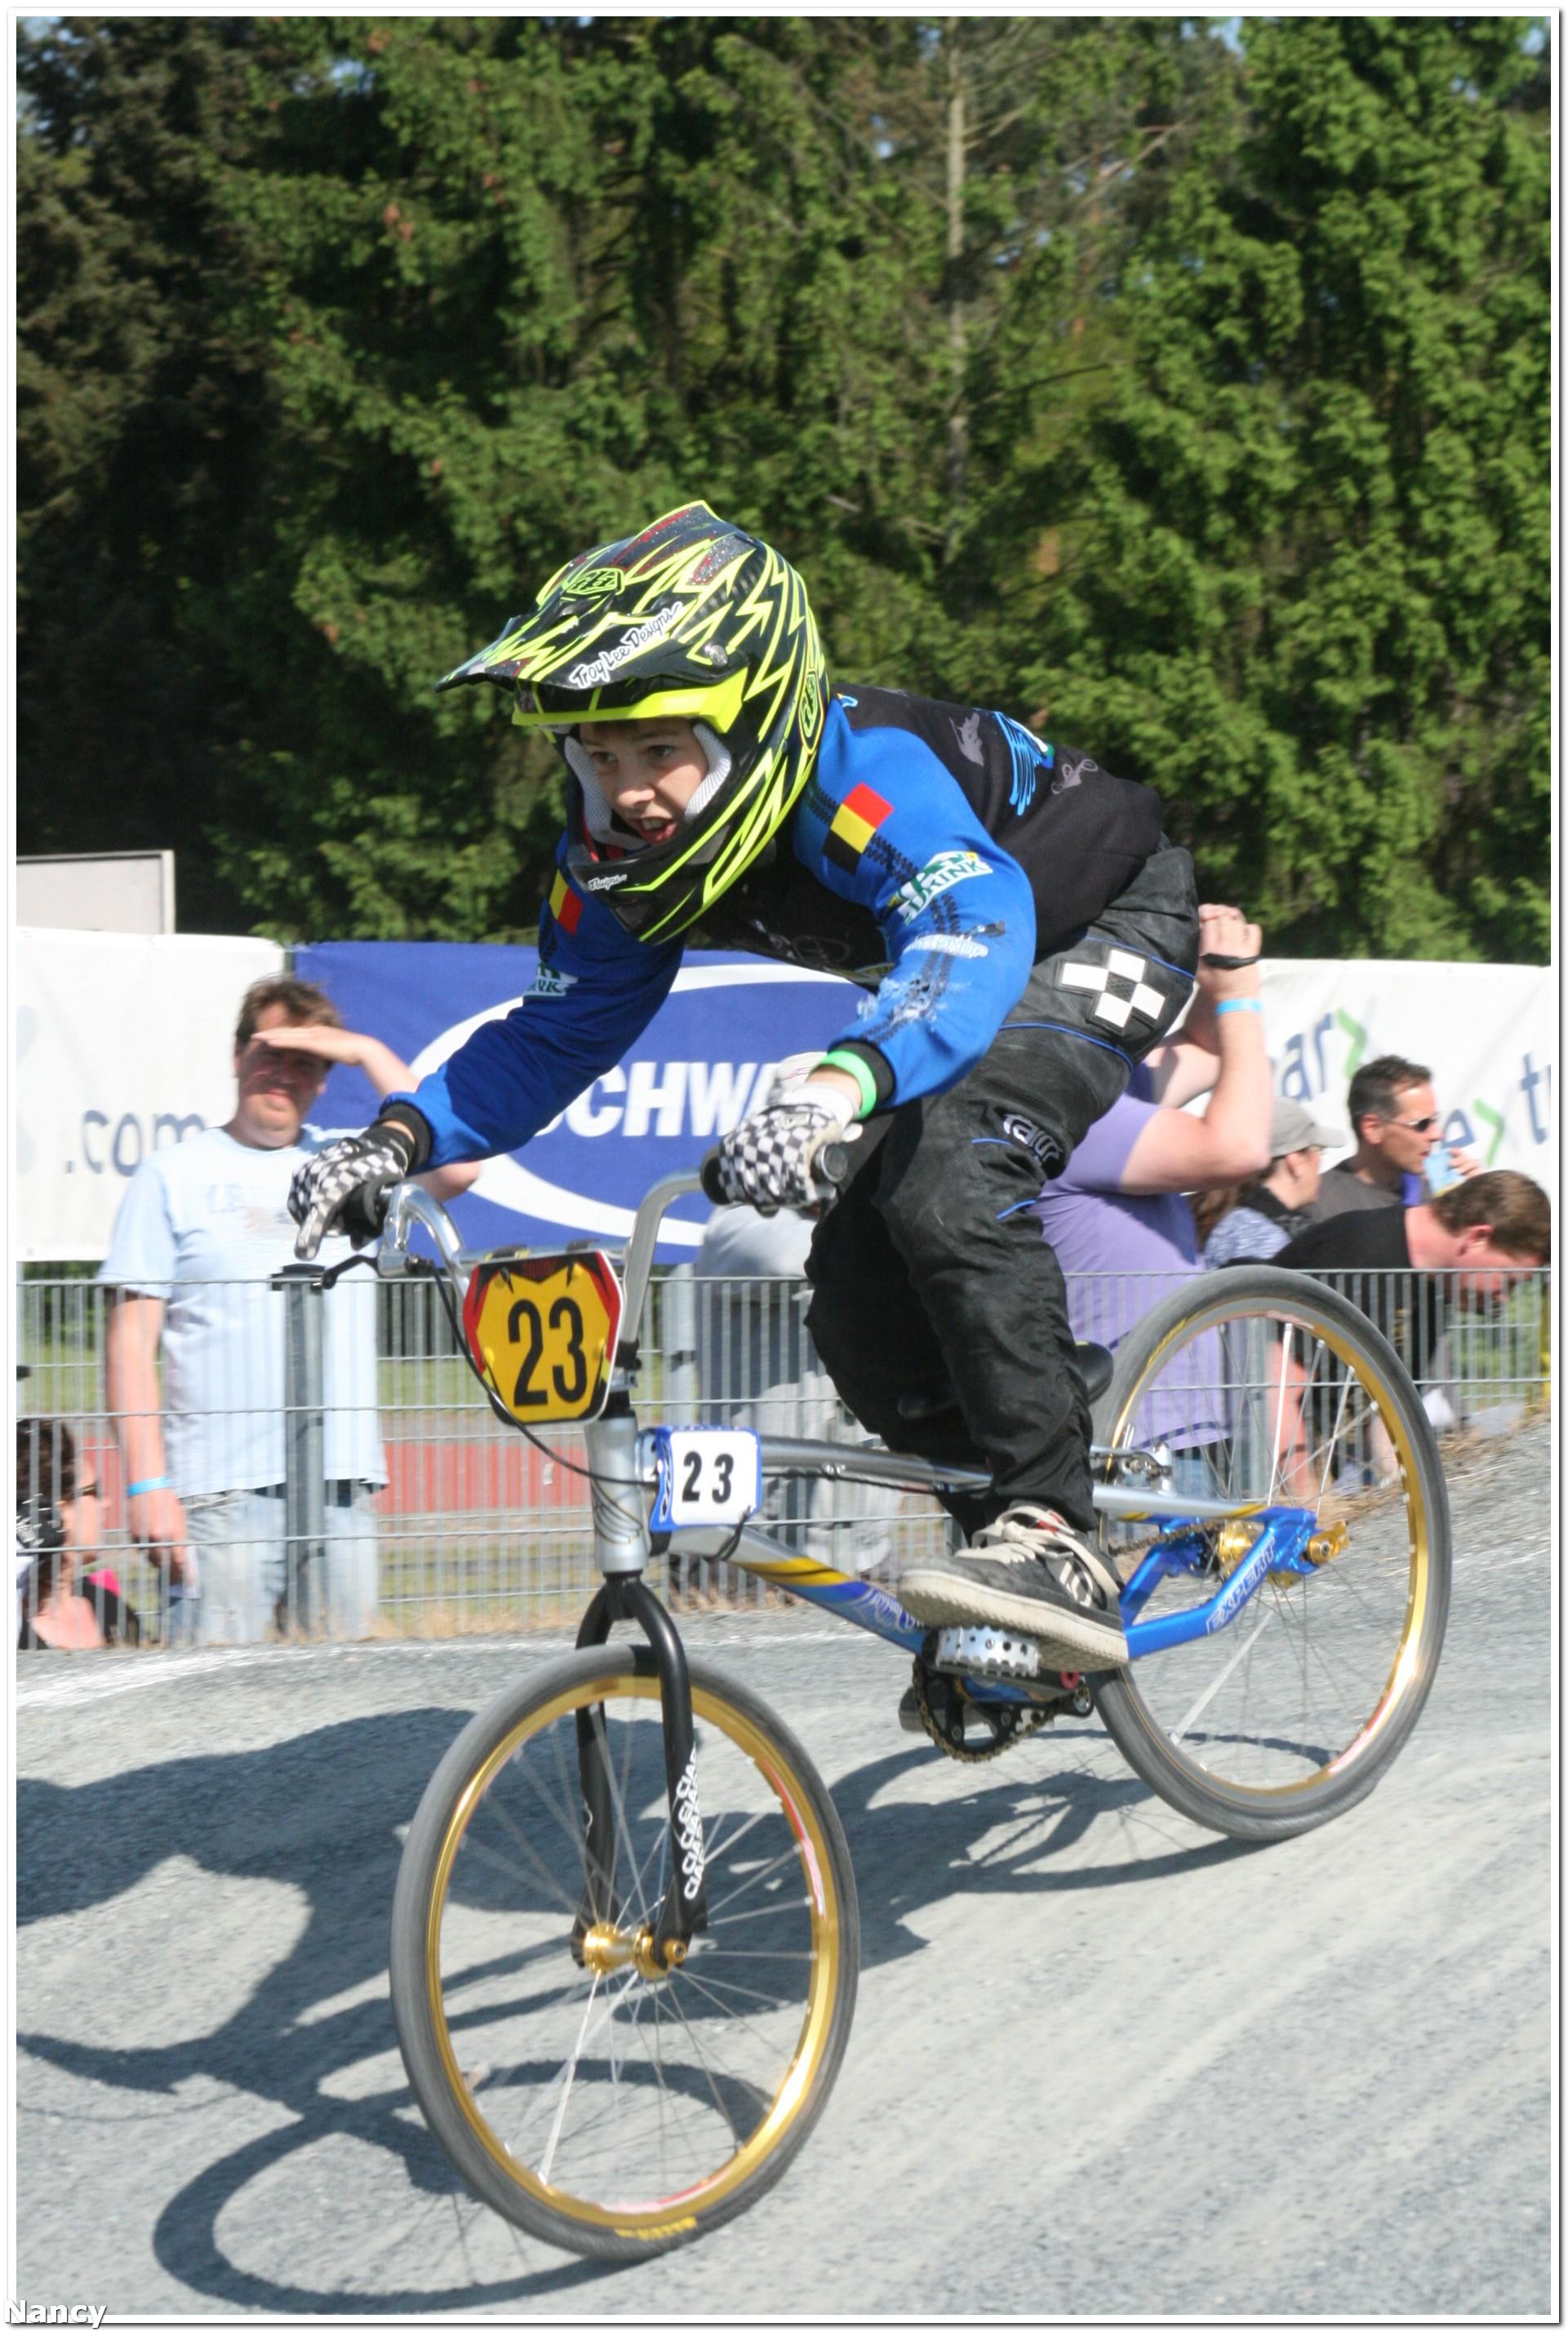 EK Ronde 1 en Ronde 2 in Frankrijk op 6 en 7 april